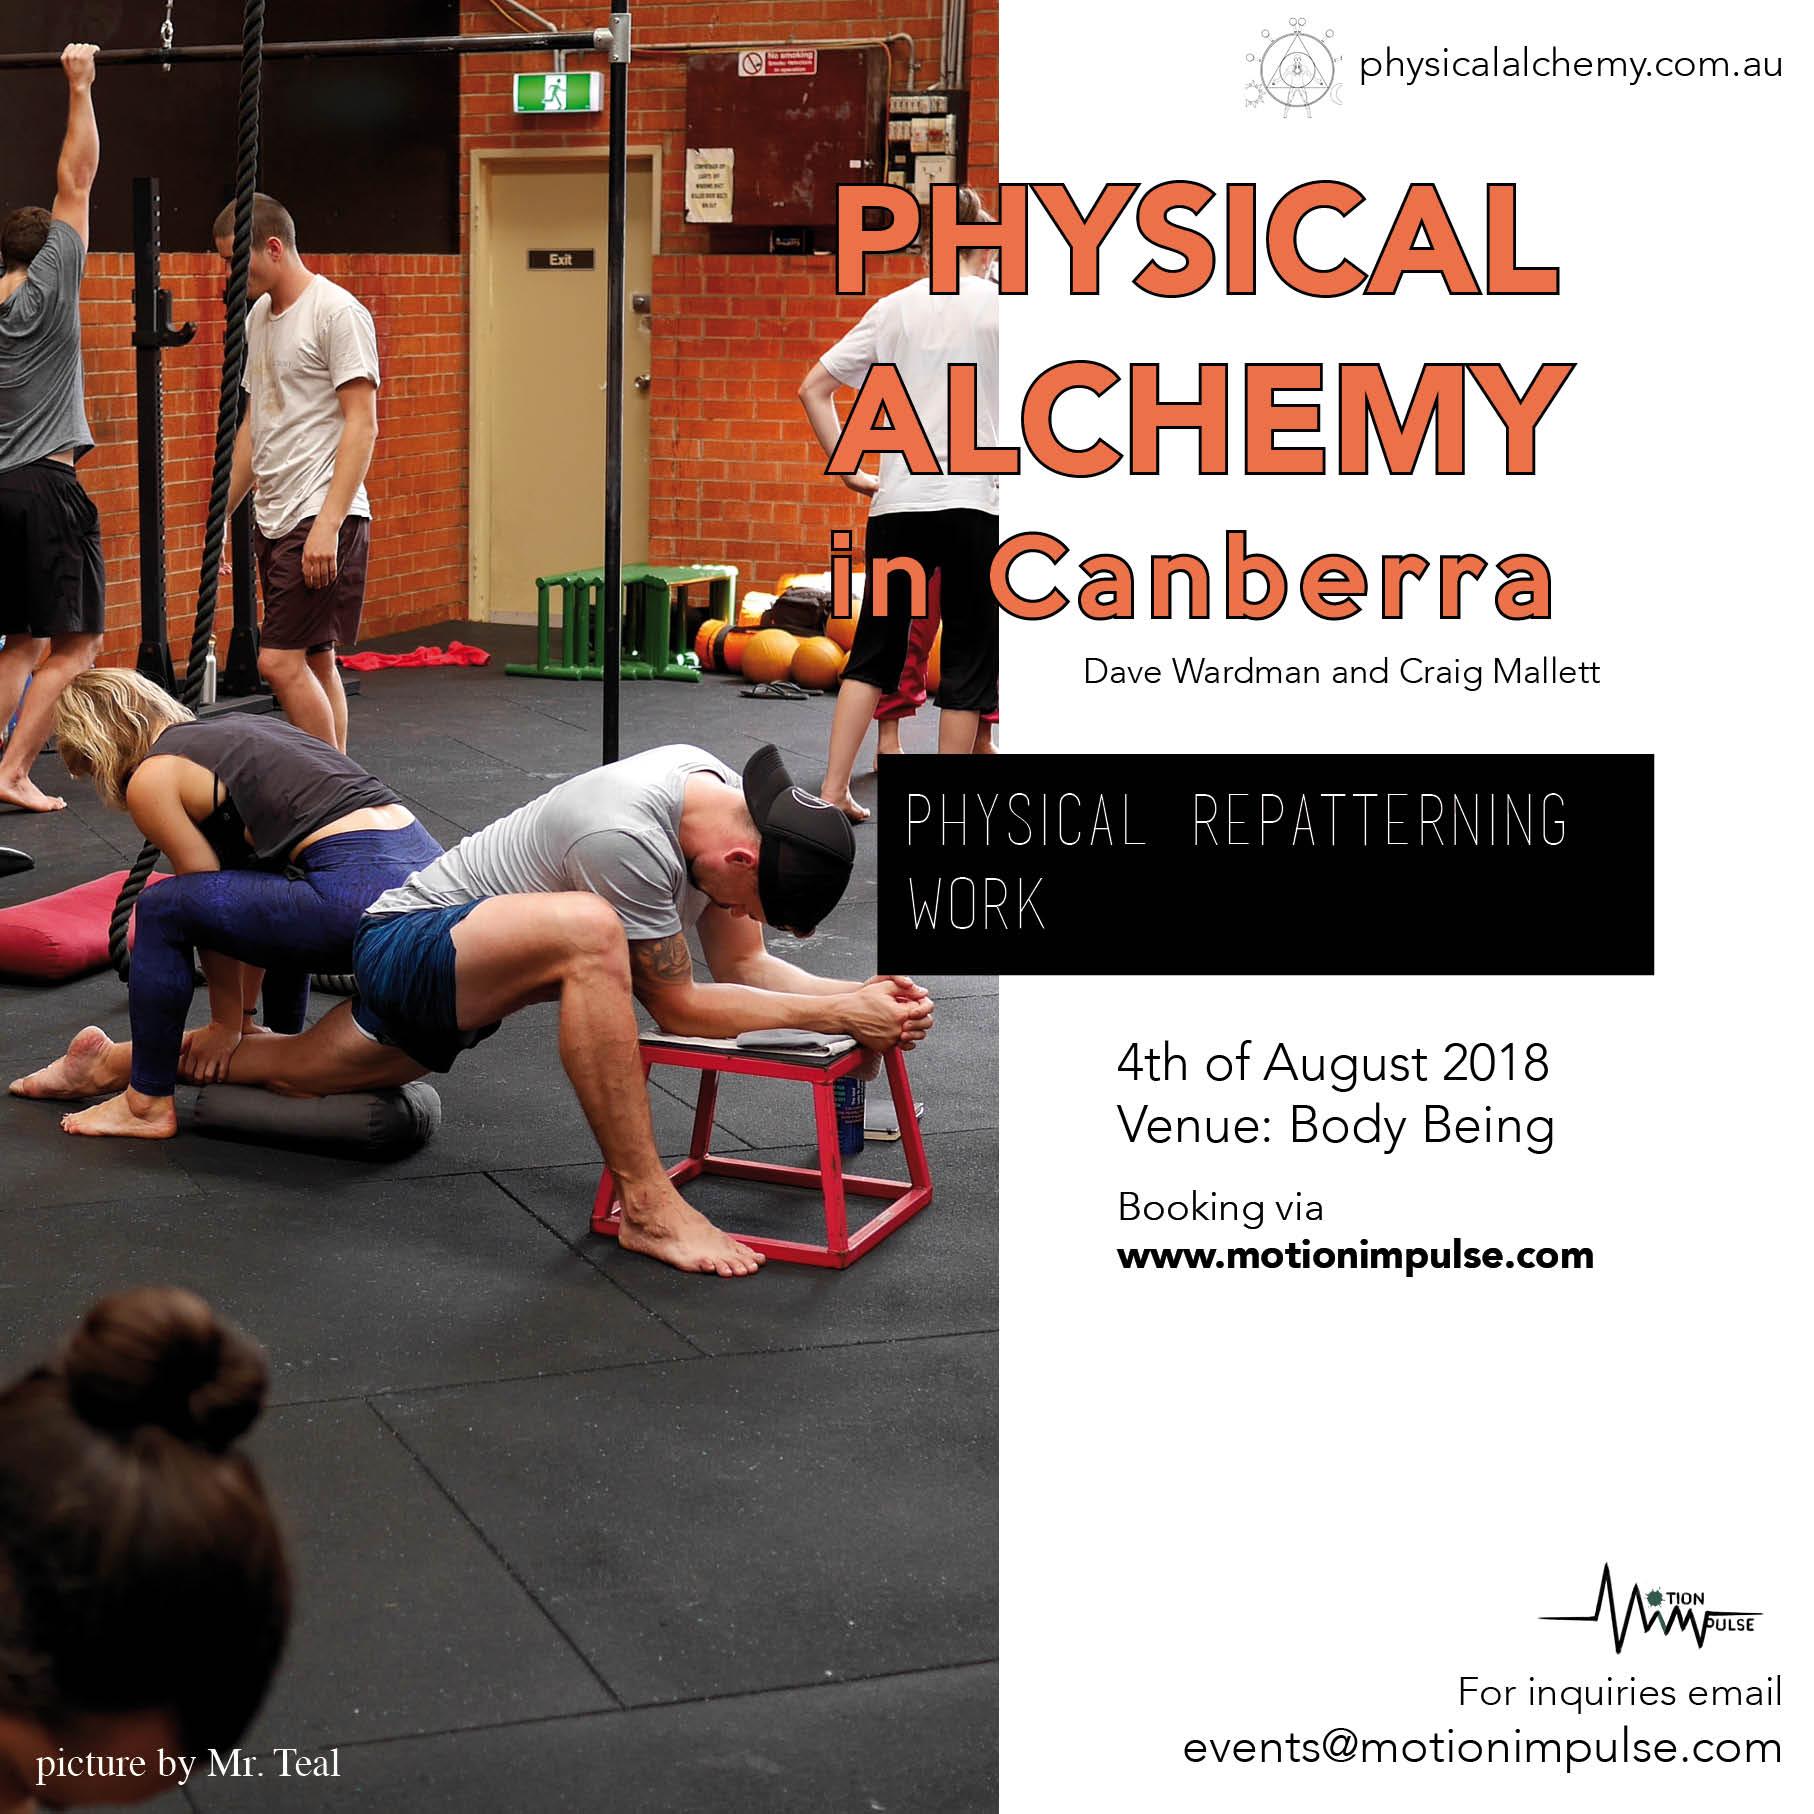 PhysicalAlchemy-Canberra-IG(new).jpg